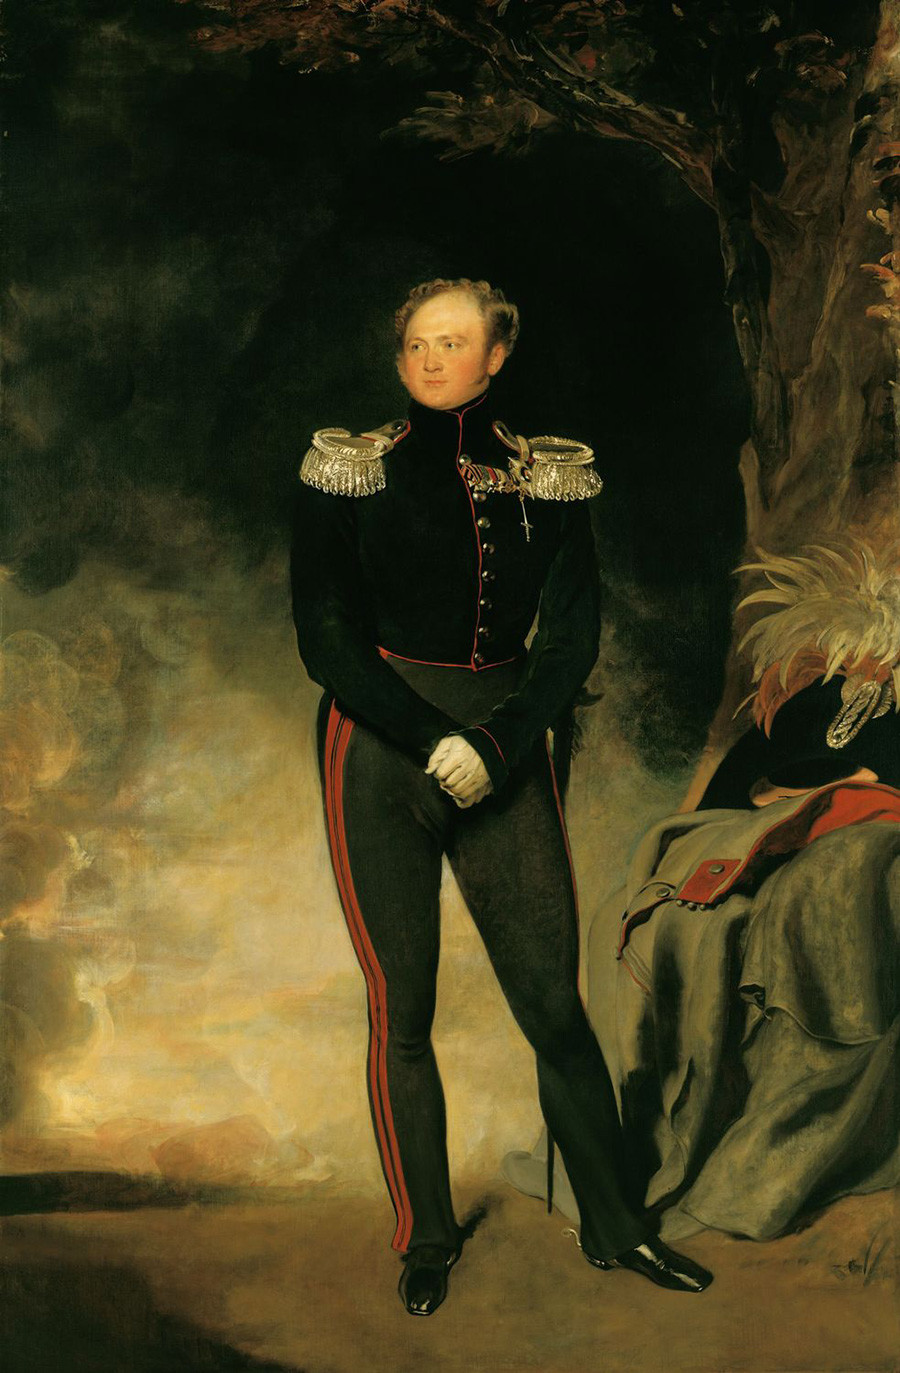 Портрет руског императора Александра I.